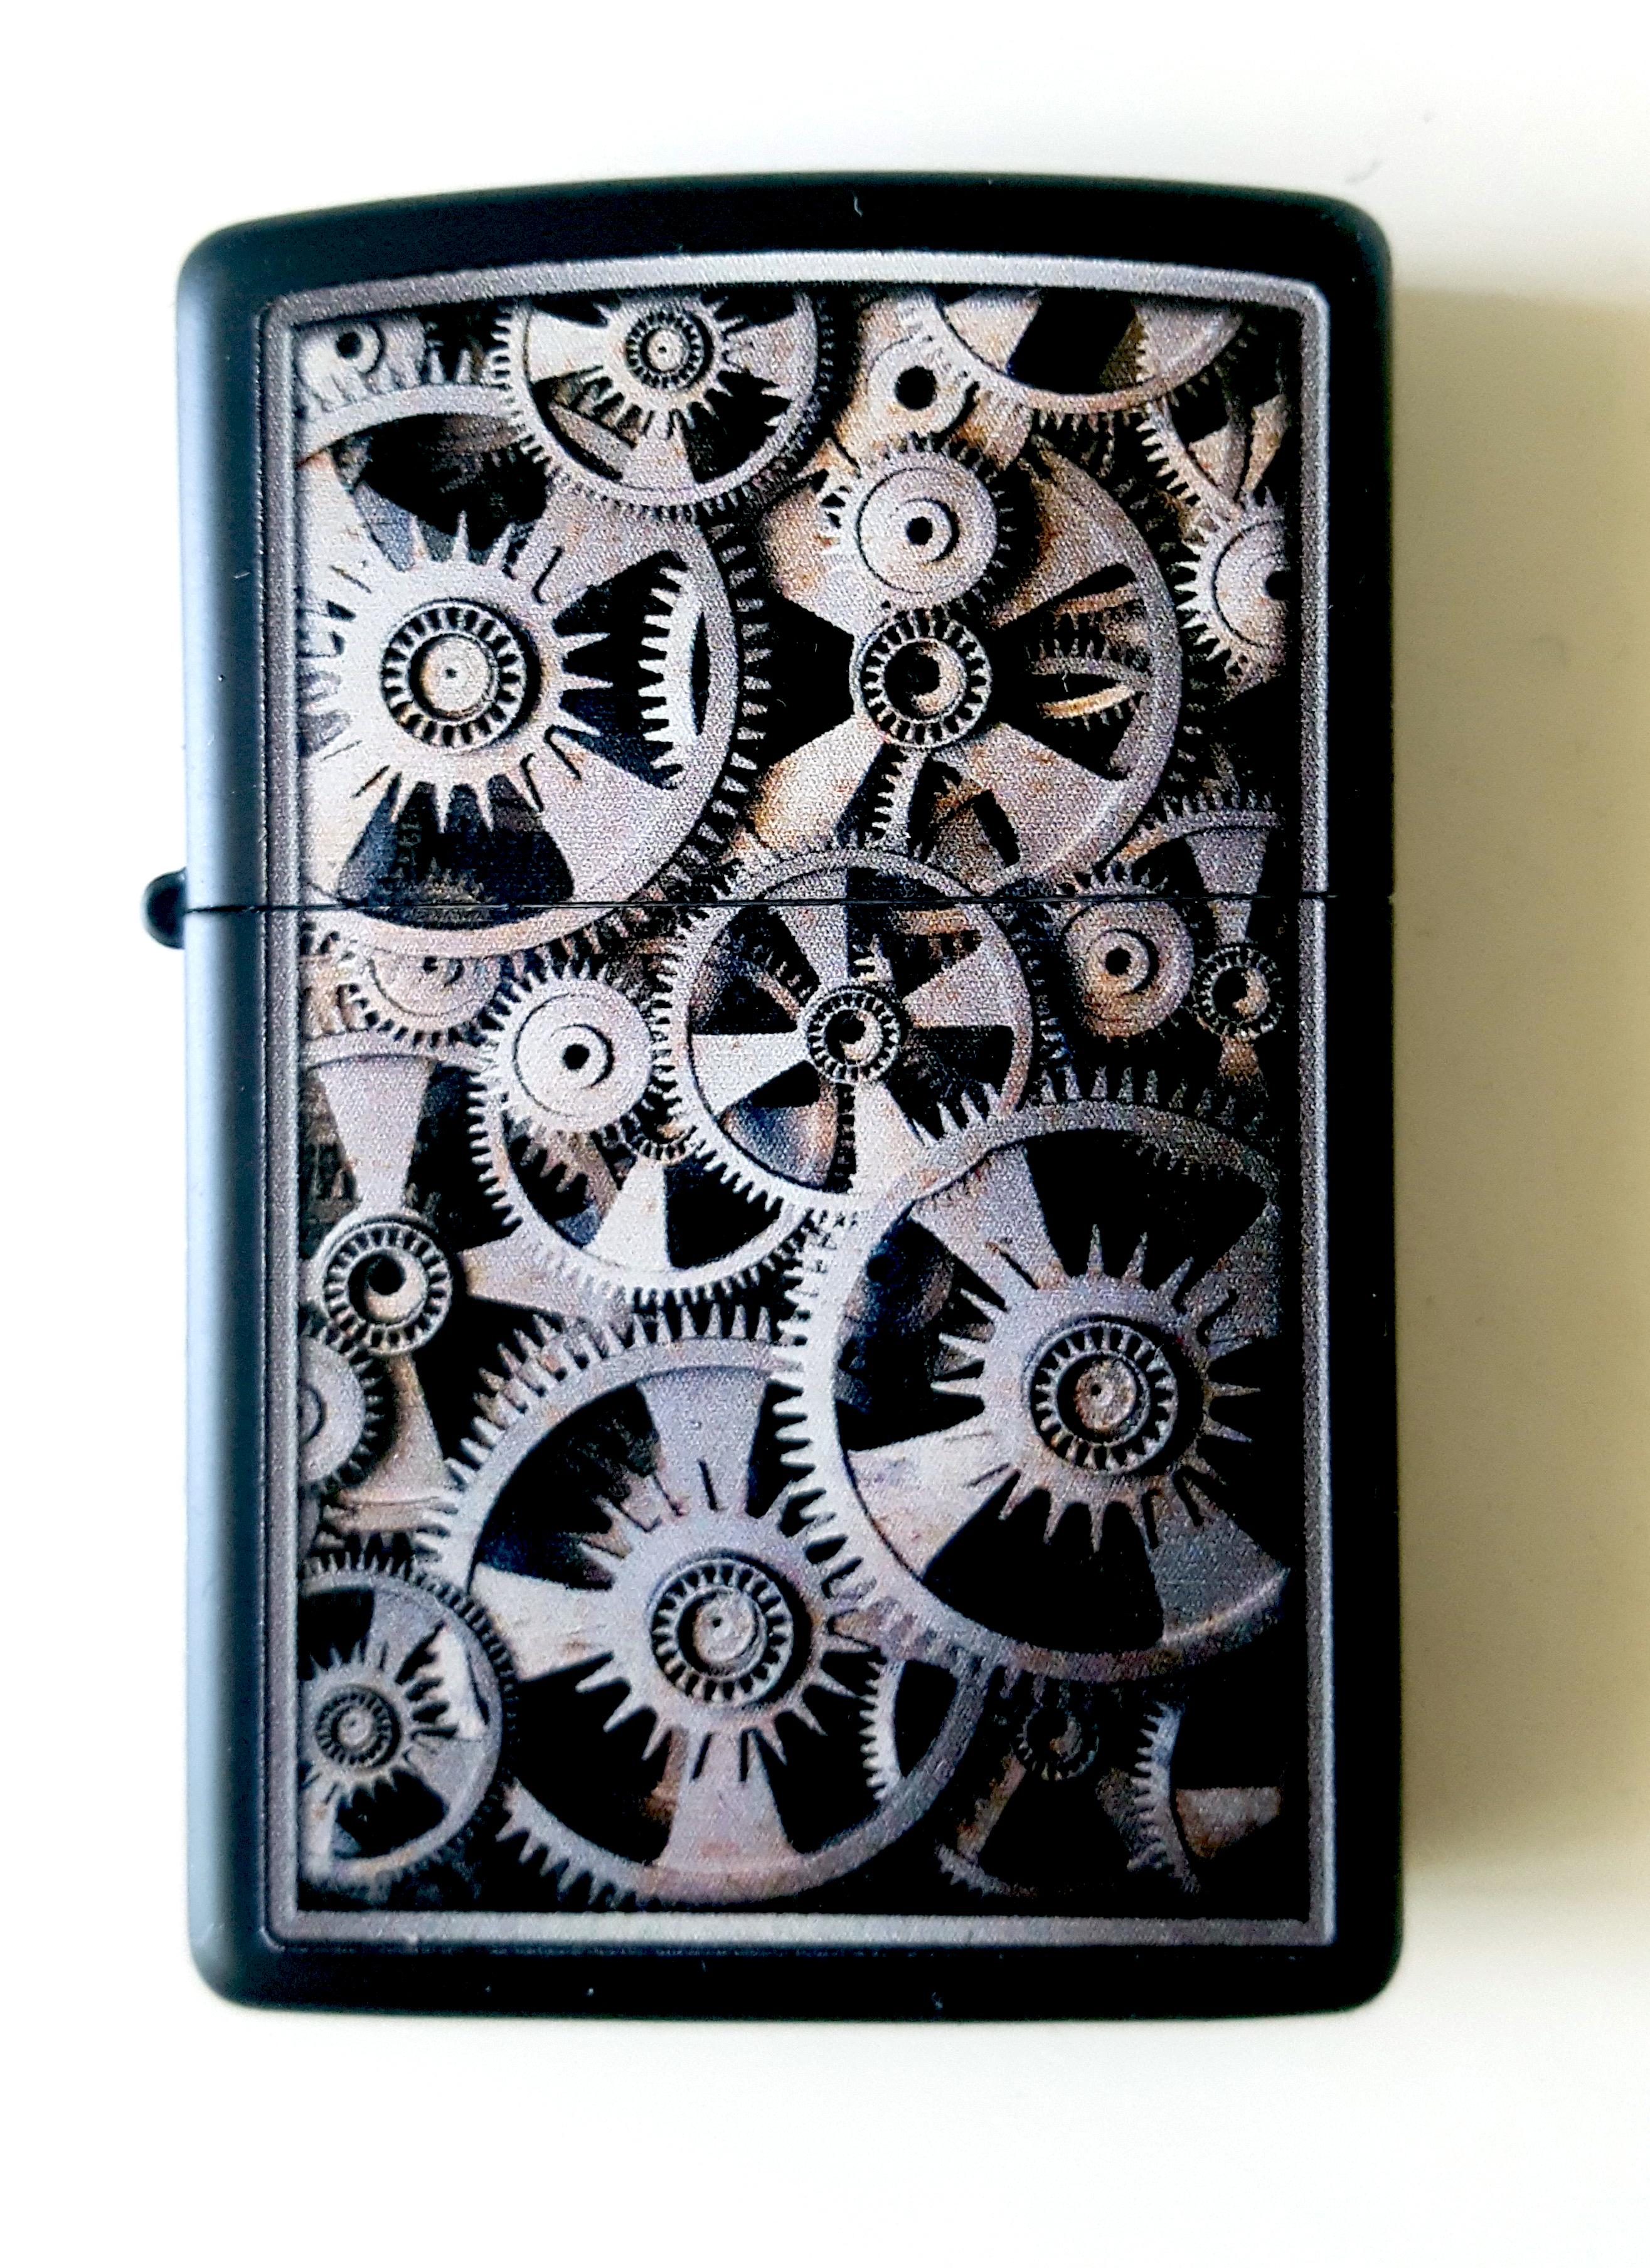 Gears and Cogwheels (2)